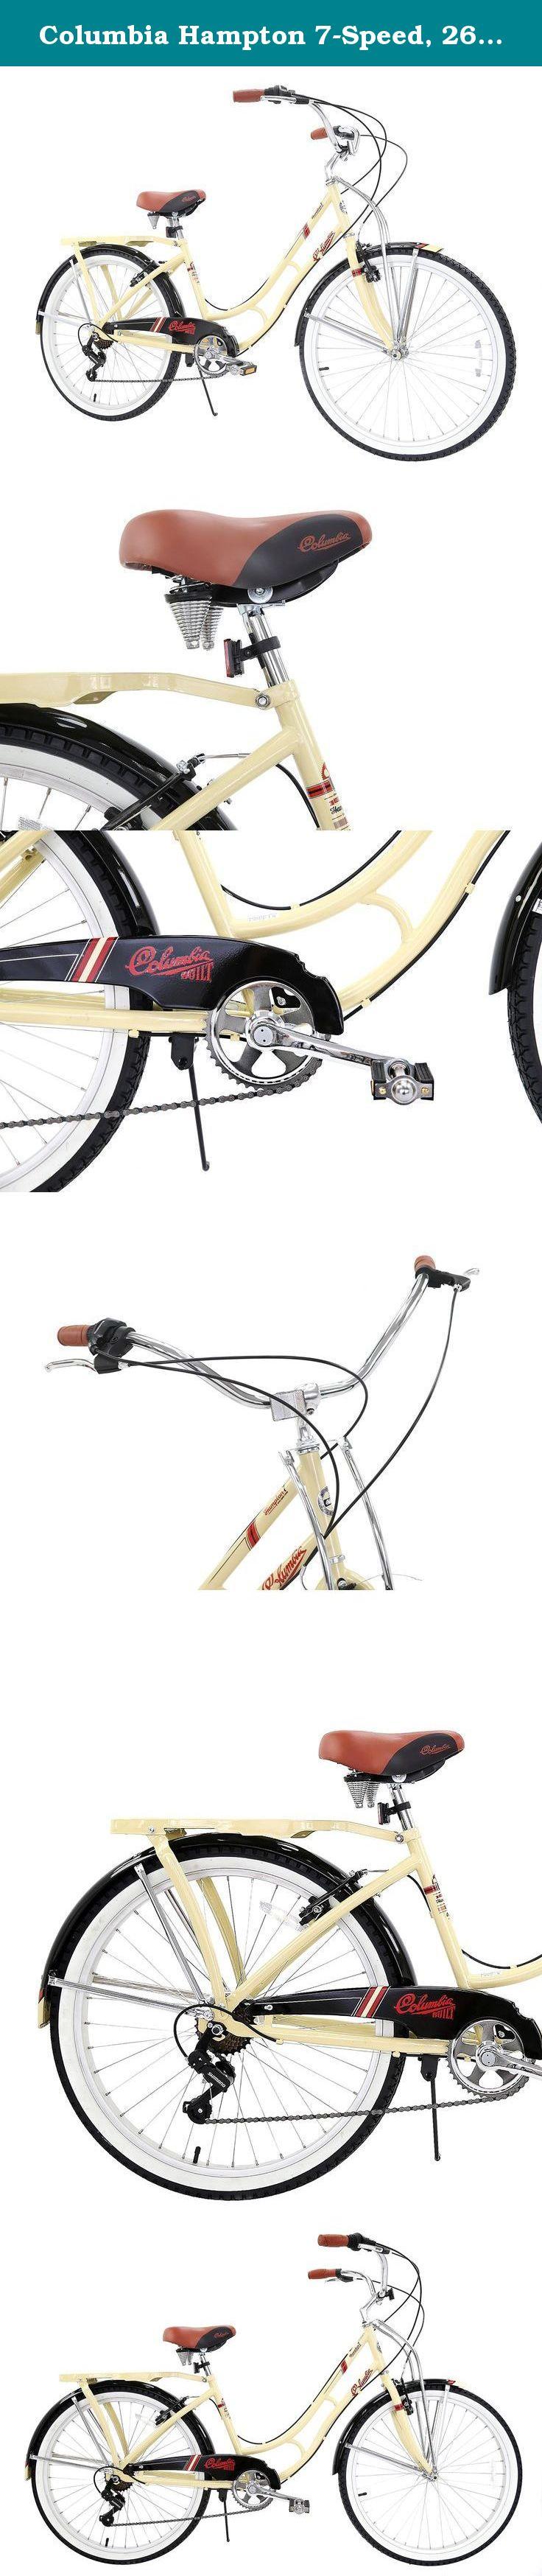 Hampton Beach Cruiser : hampton, beach, cruiser, Columbia, Hampton, 7-Speed,, 26-Inch, Women's, Retro, Bicycle., 7-Speed, Bicycle, Manufactu…, Bicycles,, Grip,, Cruiser